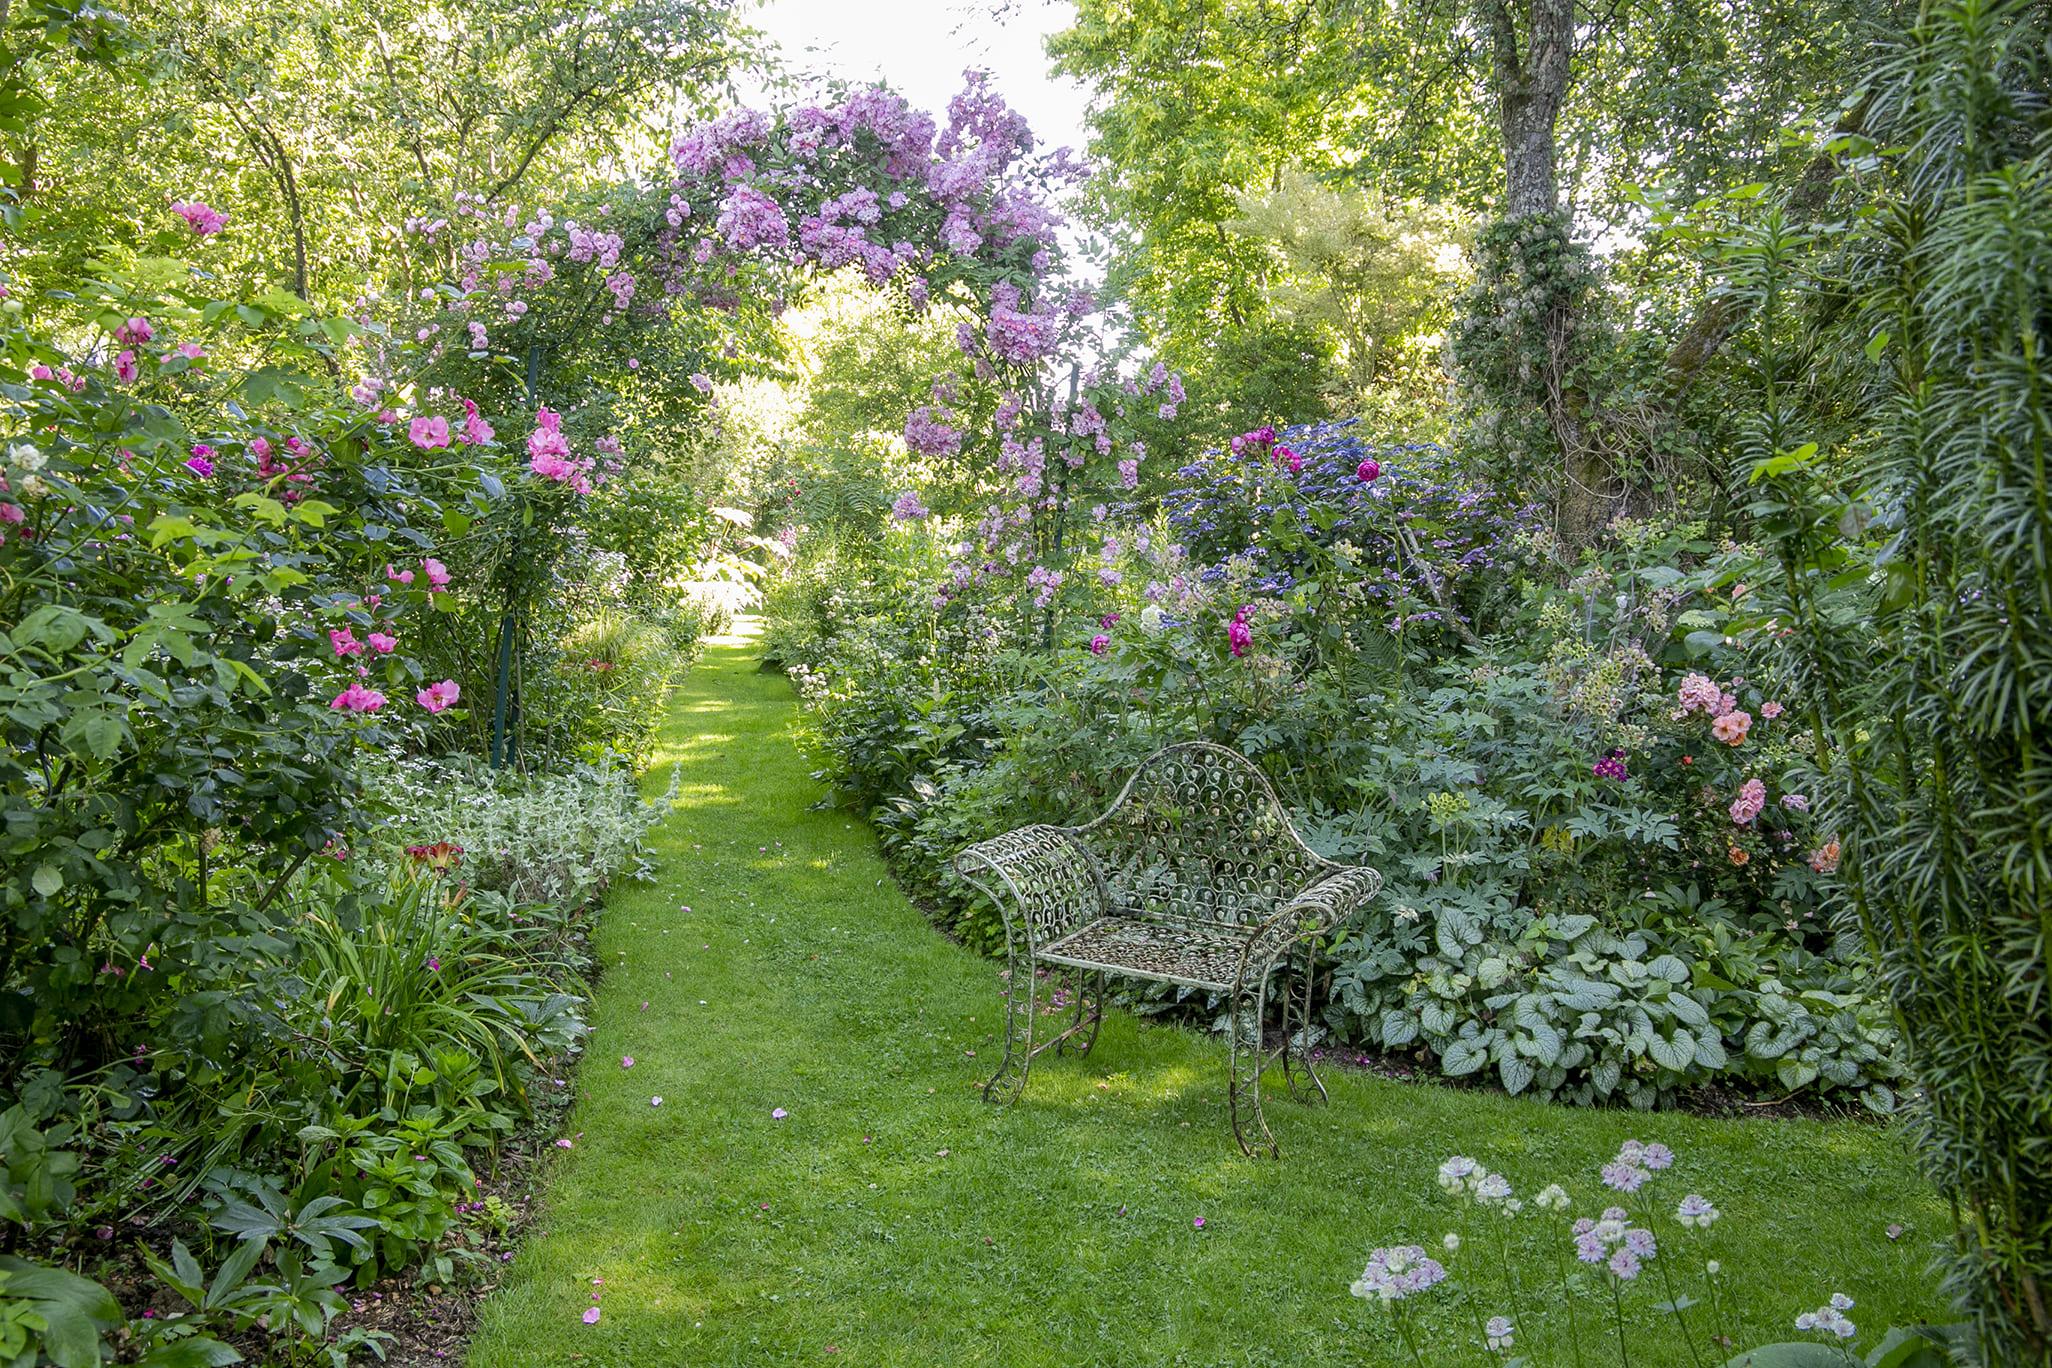 Les jardins d'angélique